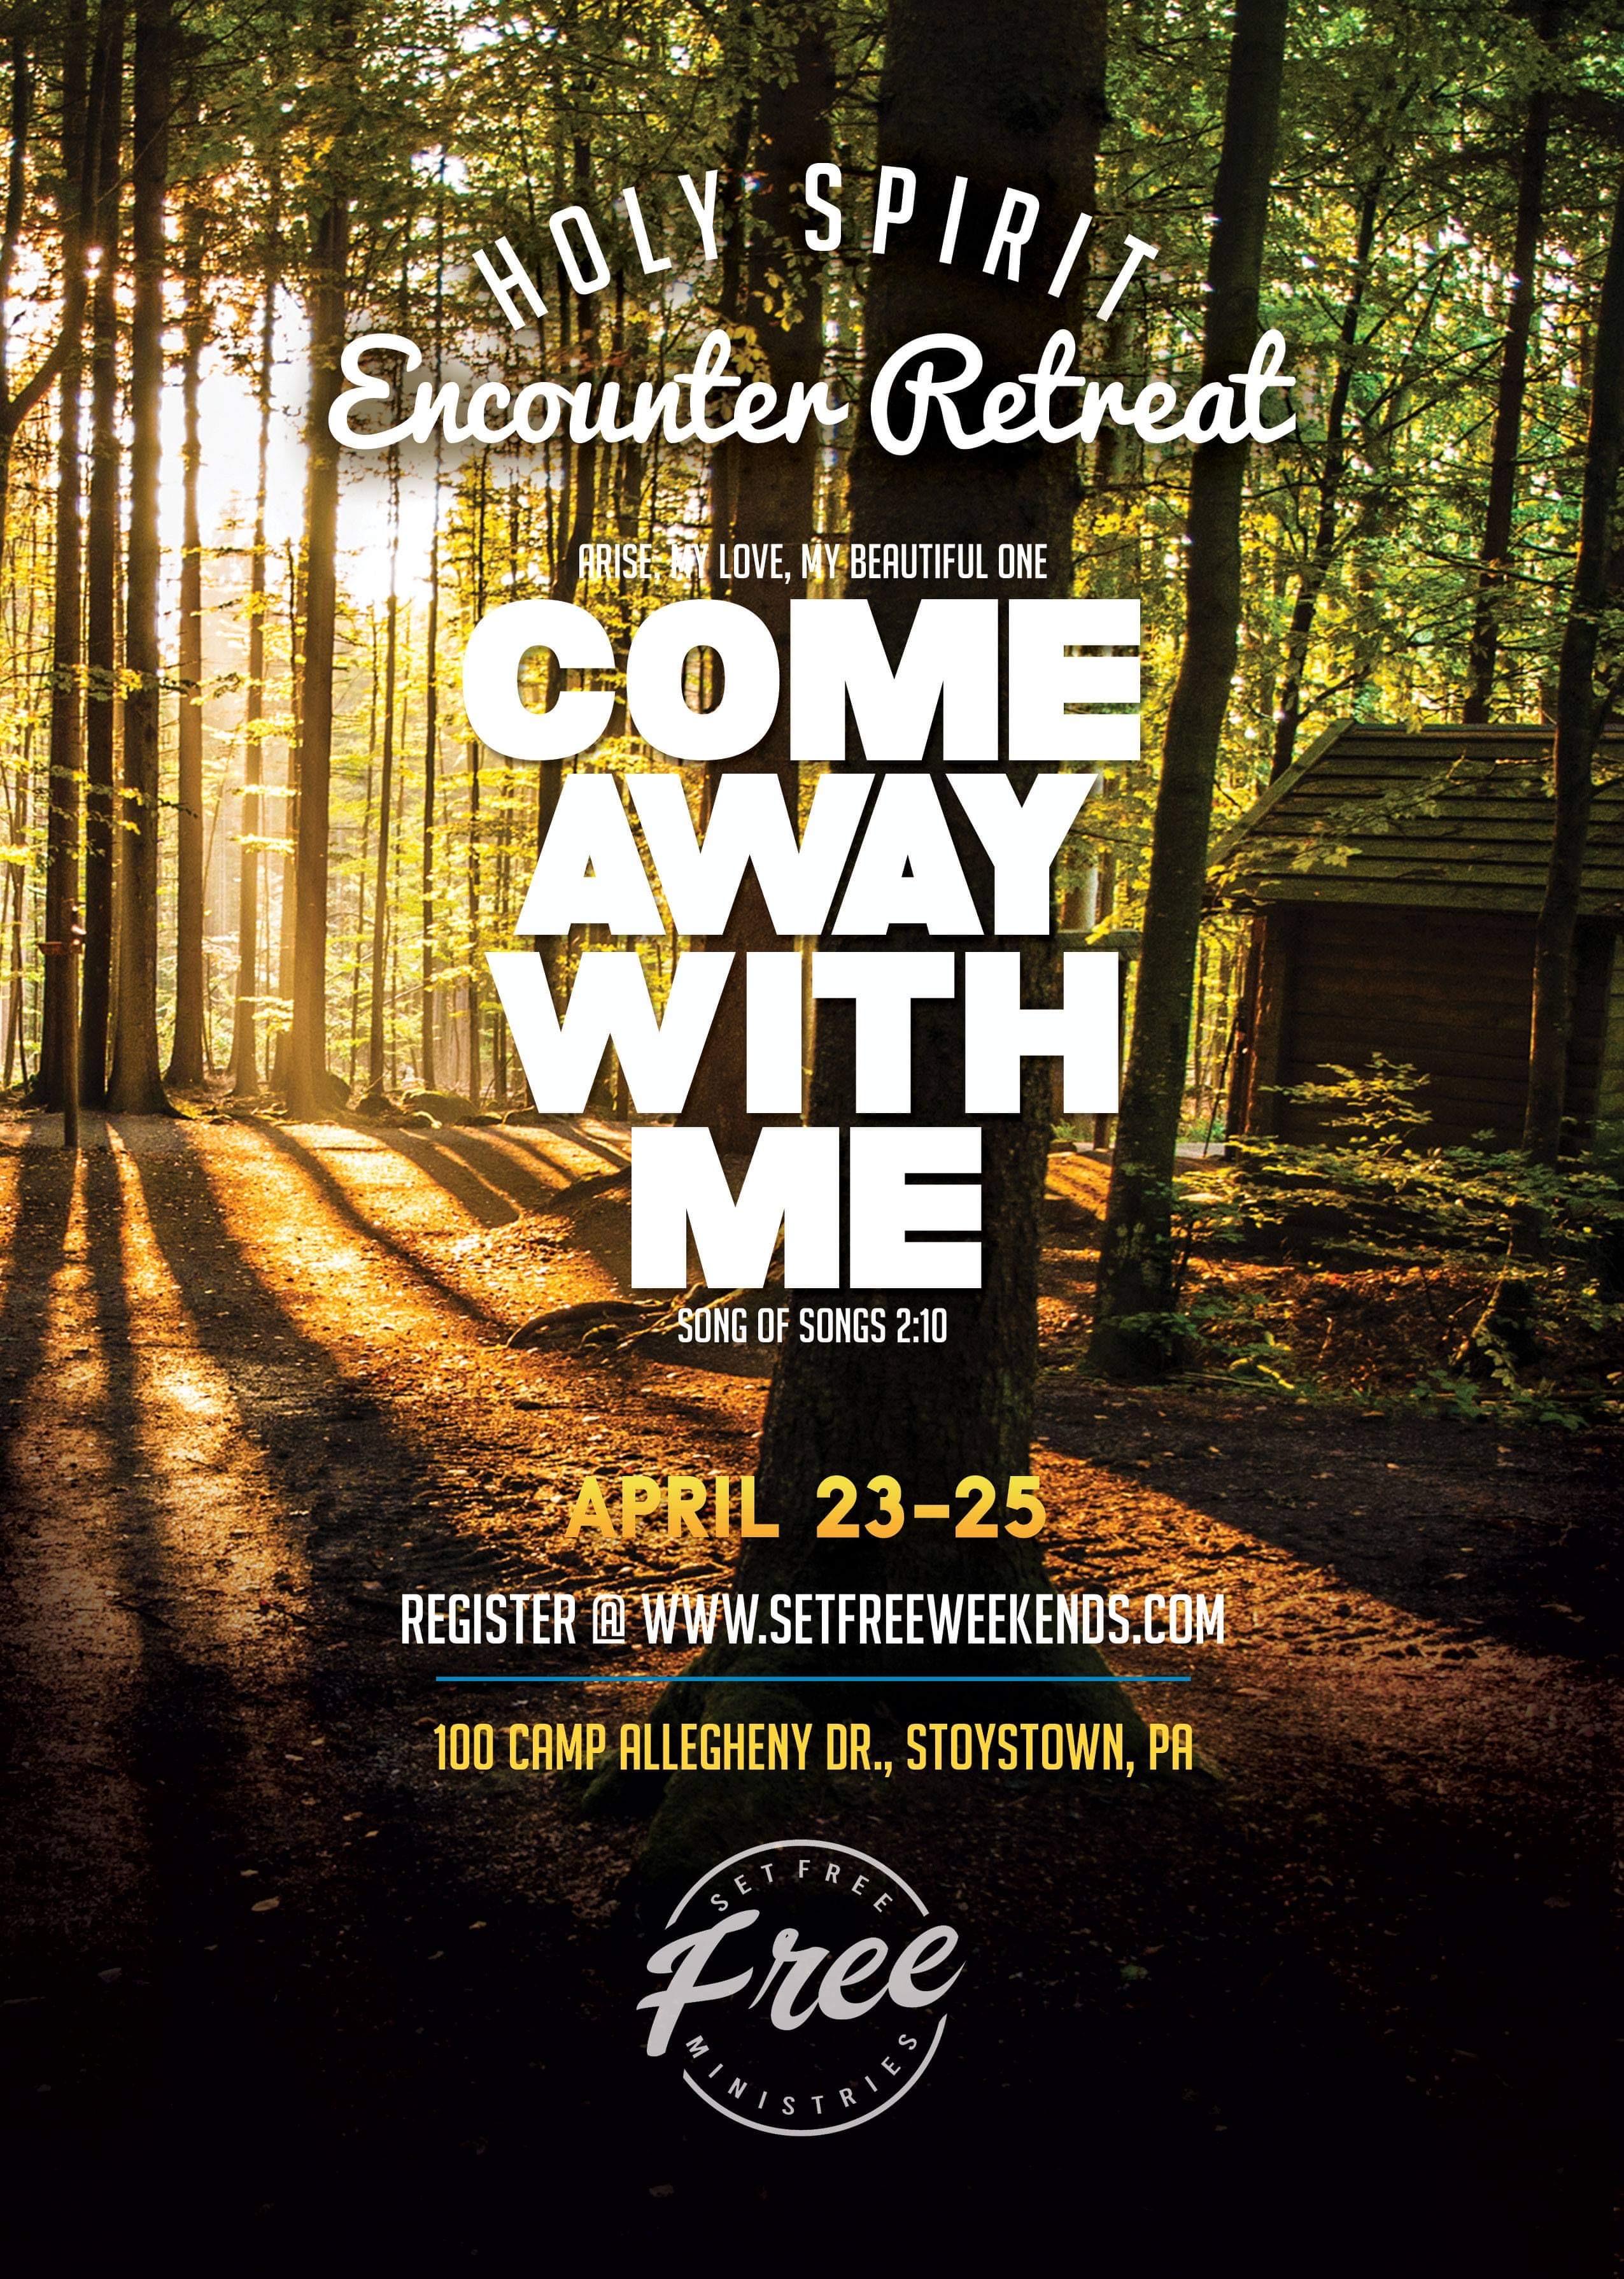 Holy Spirit Encounter Retreat